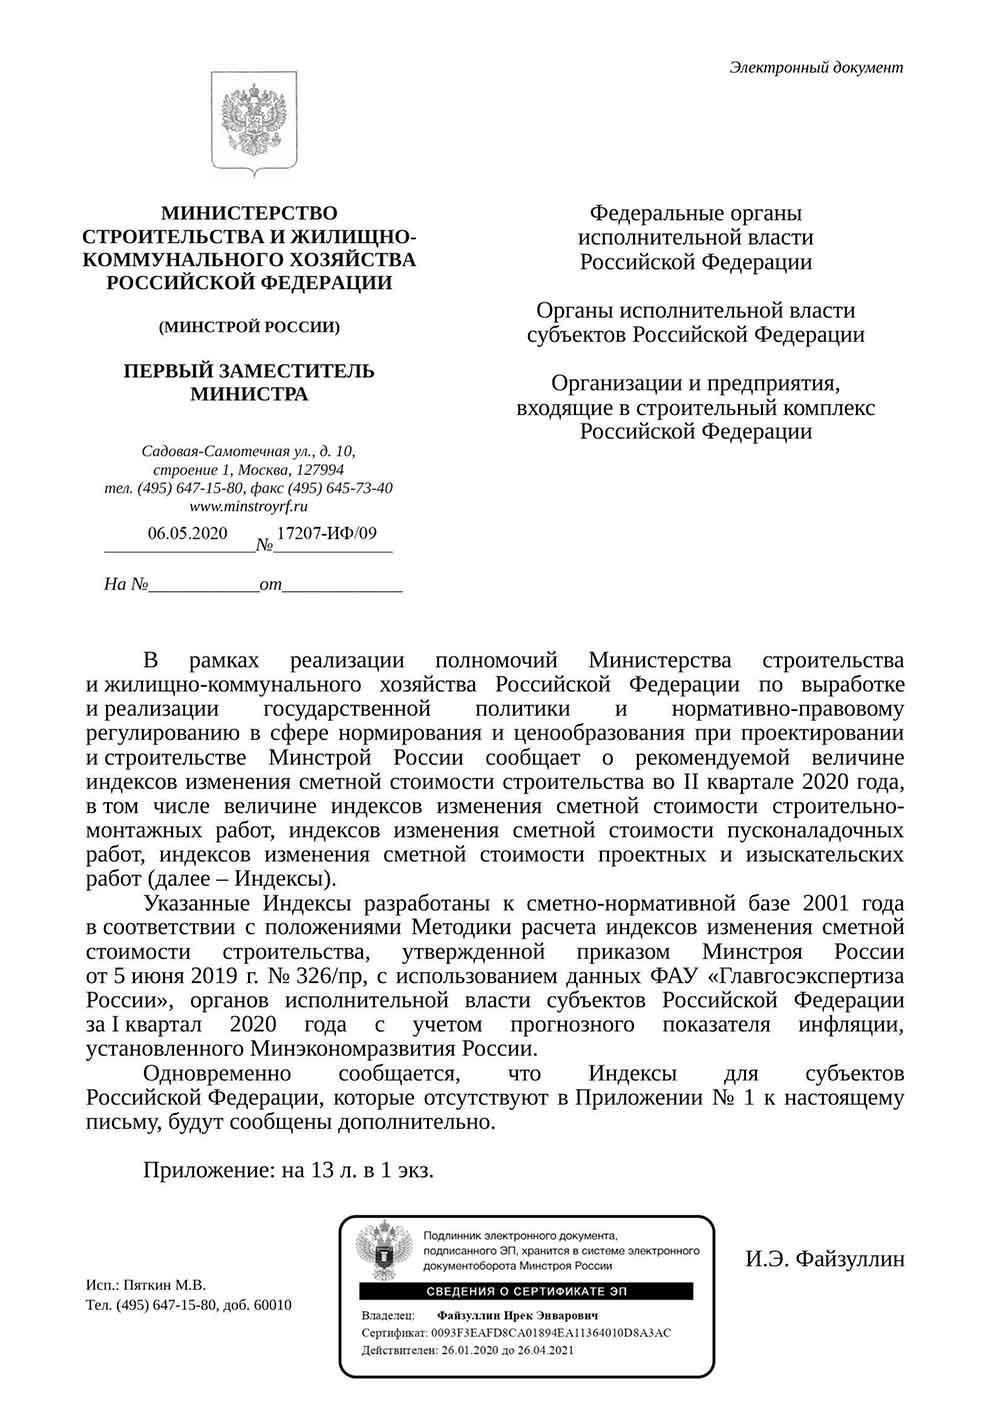 Письмо Минстроя РФ №17207-ИФ/09 от 06.05.2020 г.